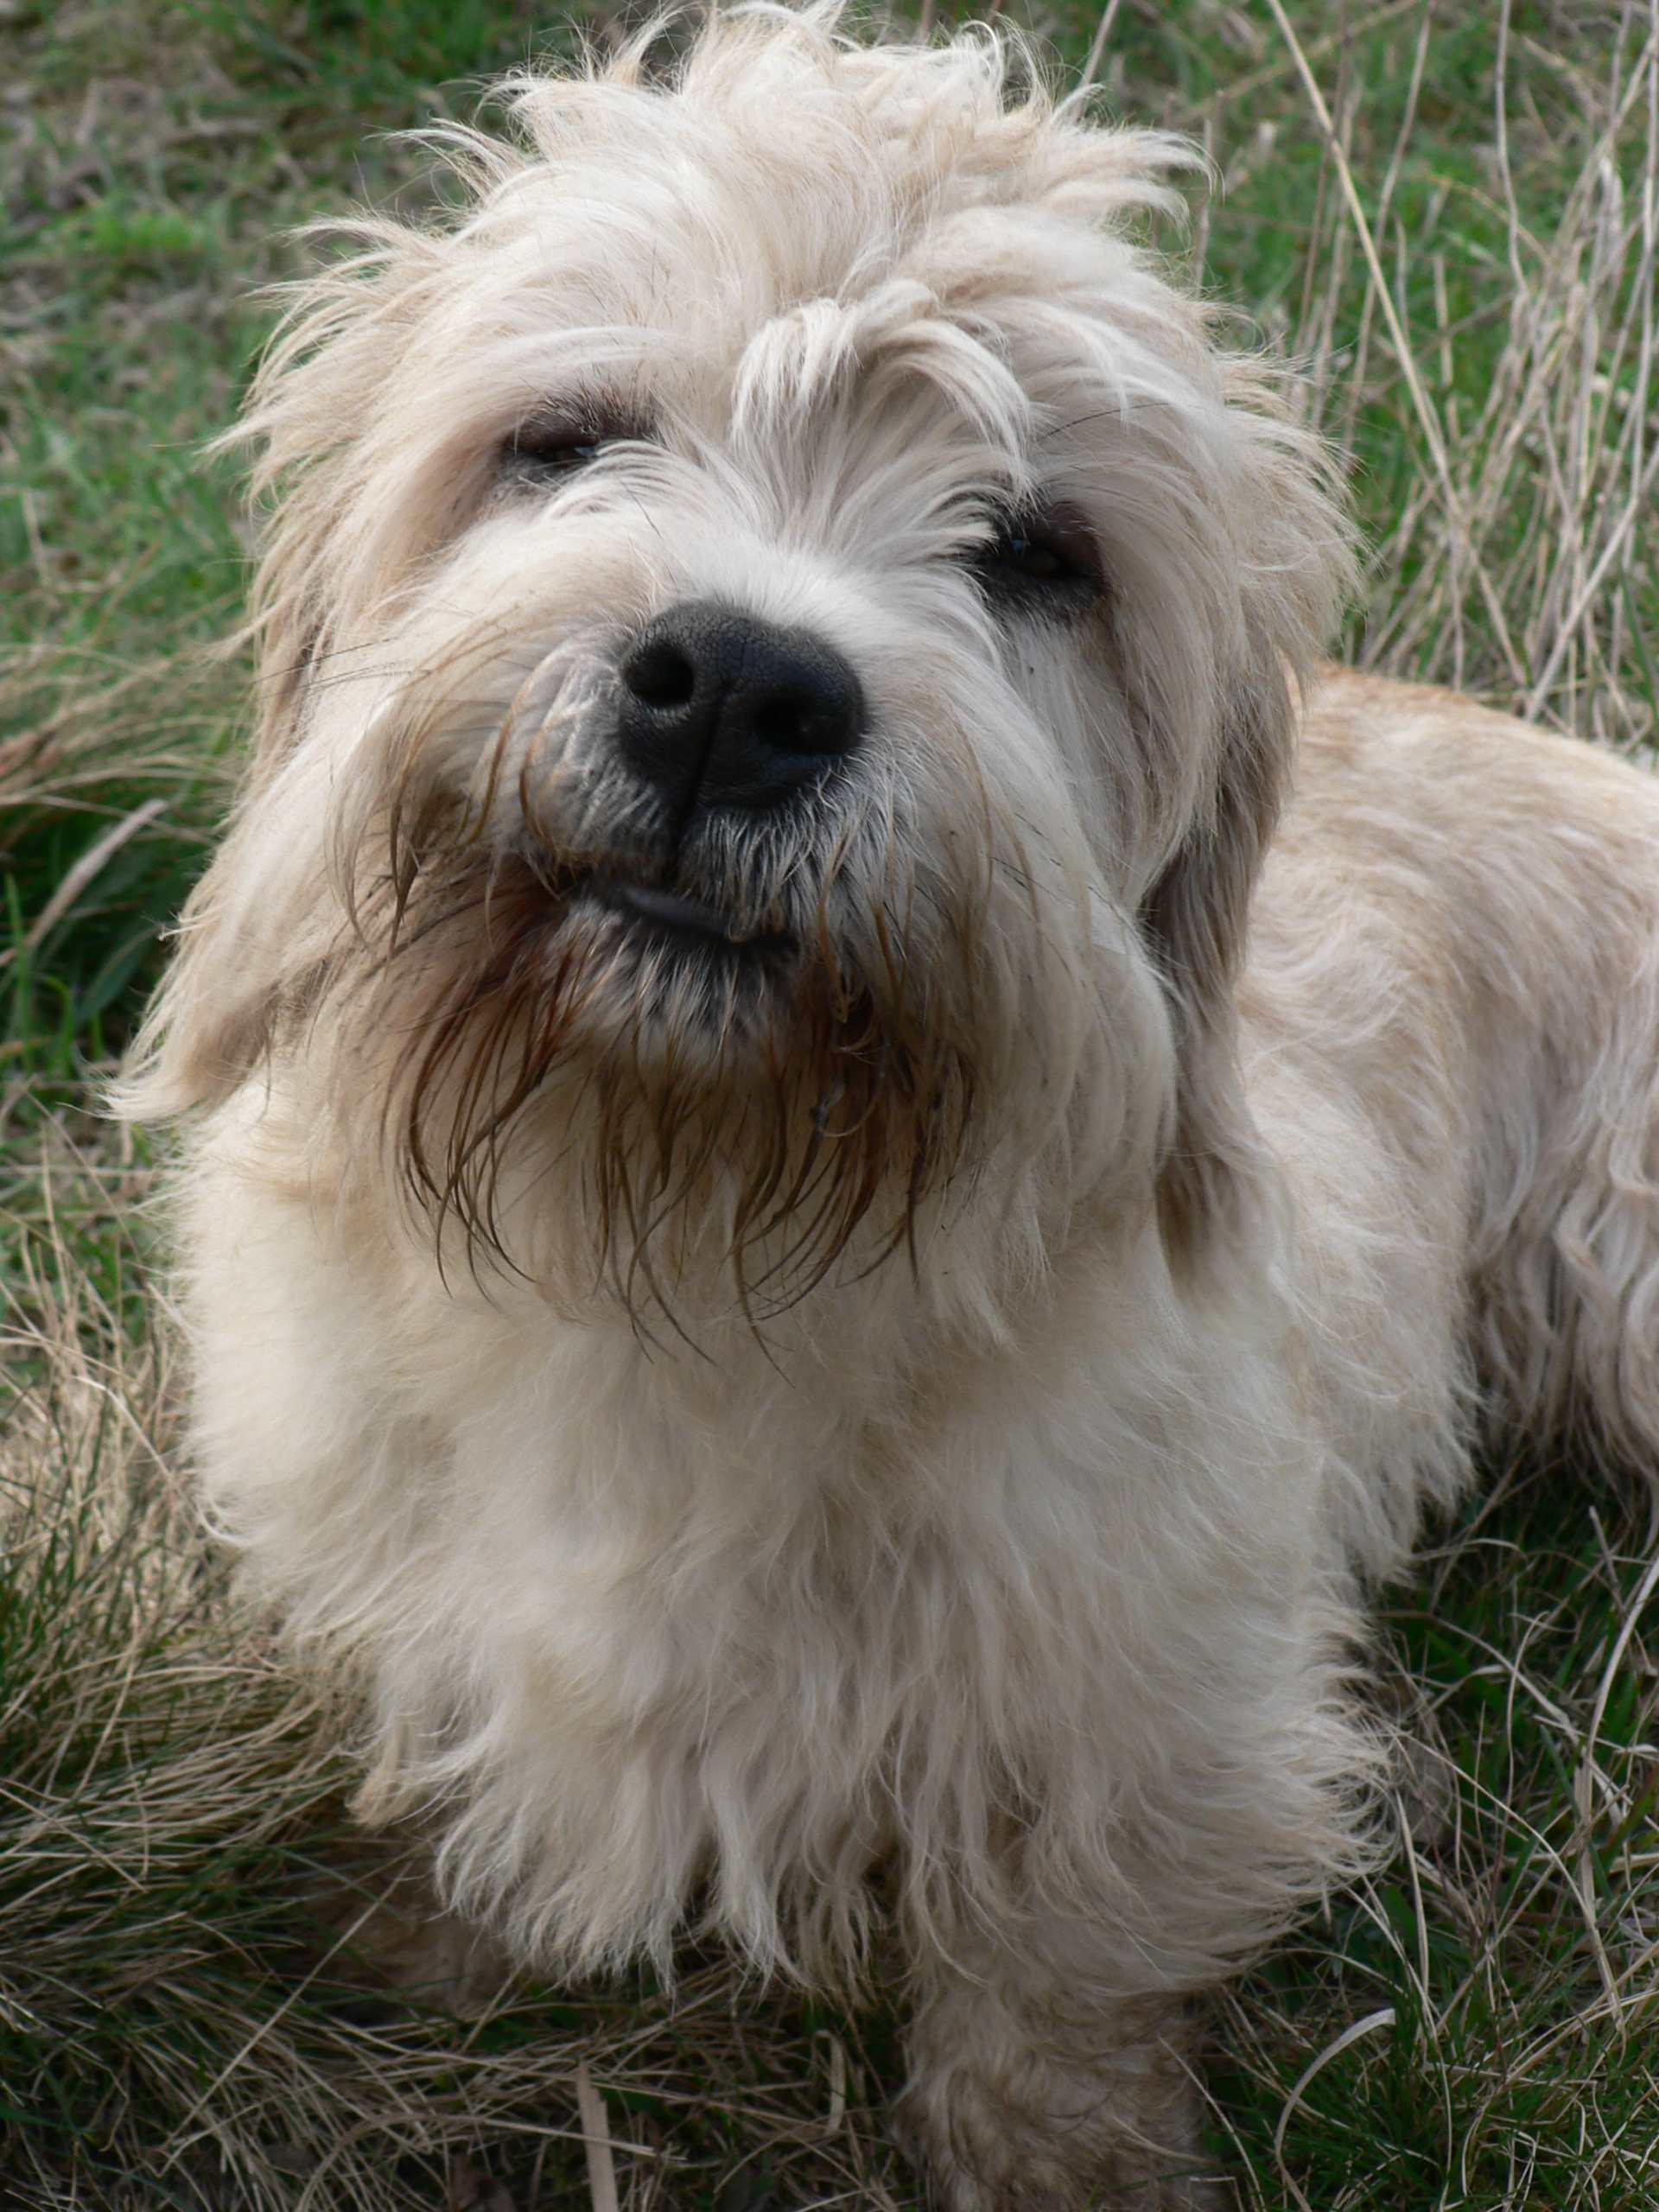 Cute Face Wallpaper Desktop Dandie Dinmont Terrier Face Photo And Wallpaper Beautiful